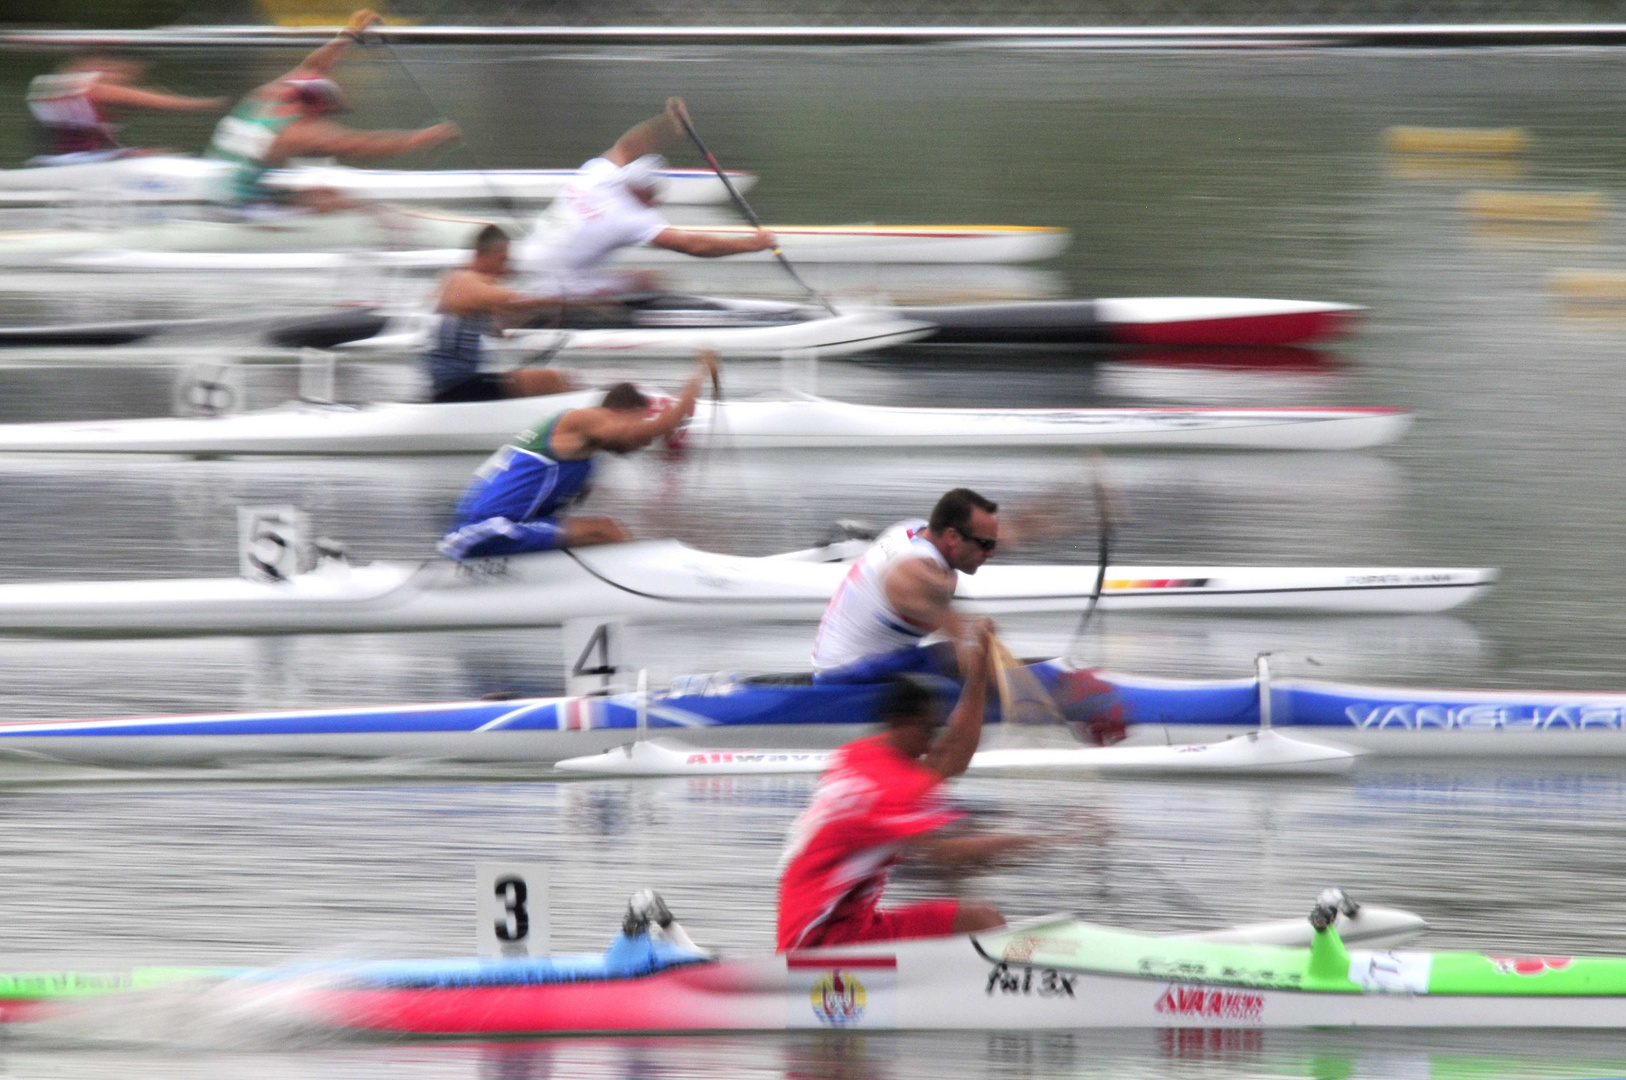 Kanu WM / Canoe WC Duisburg 2013 - 03